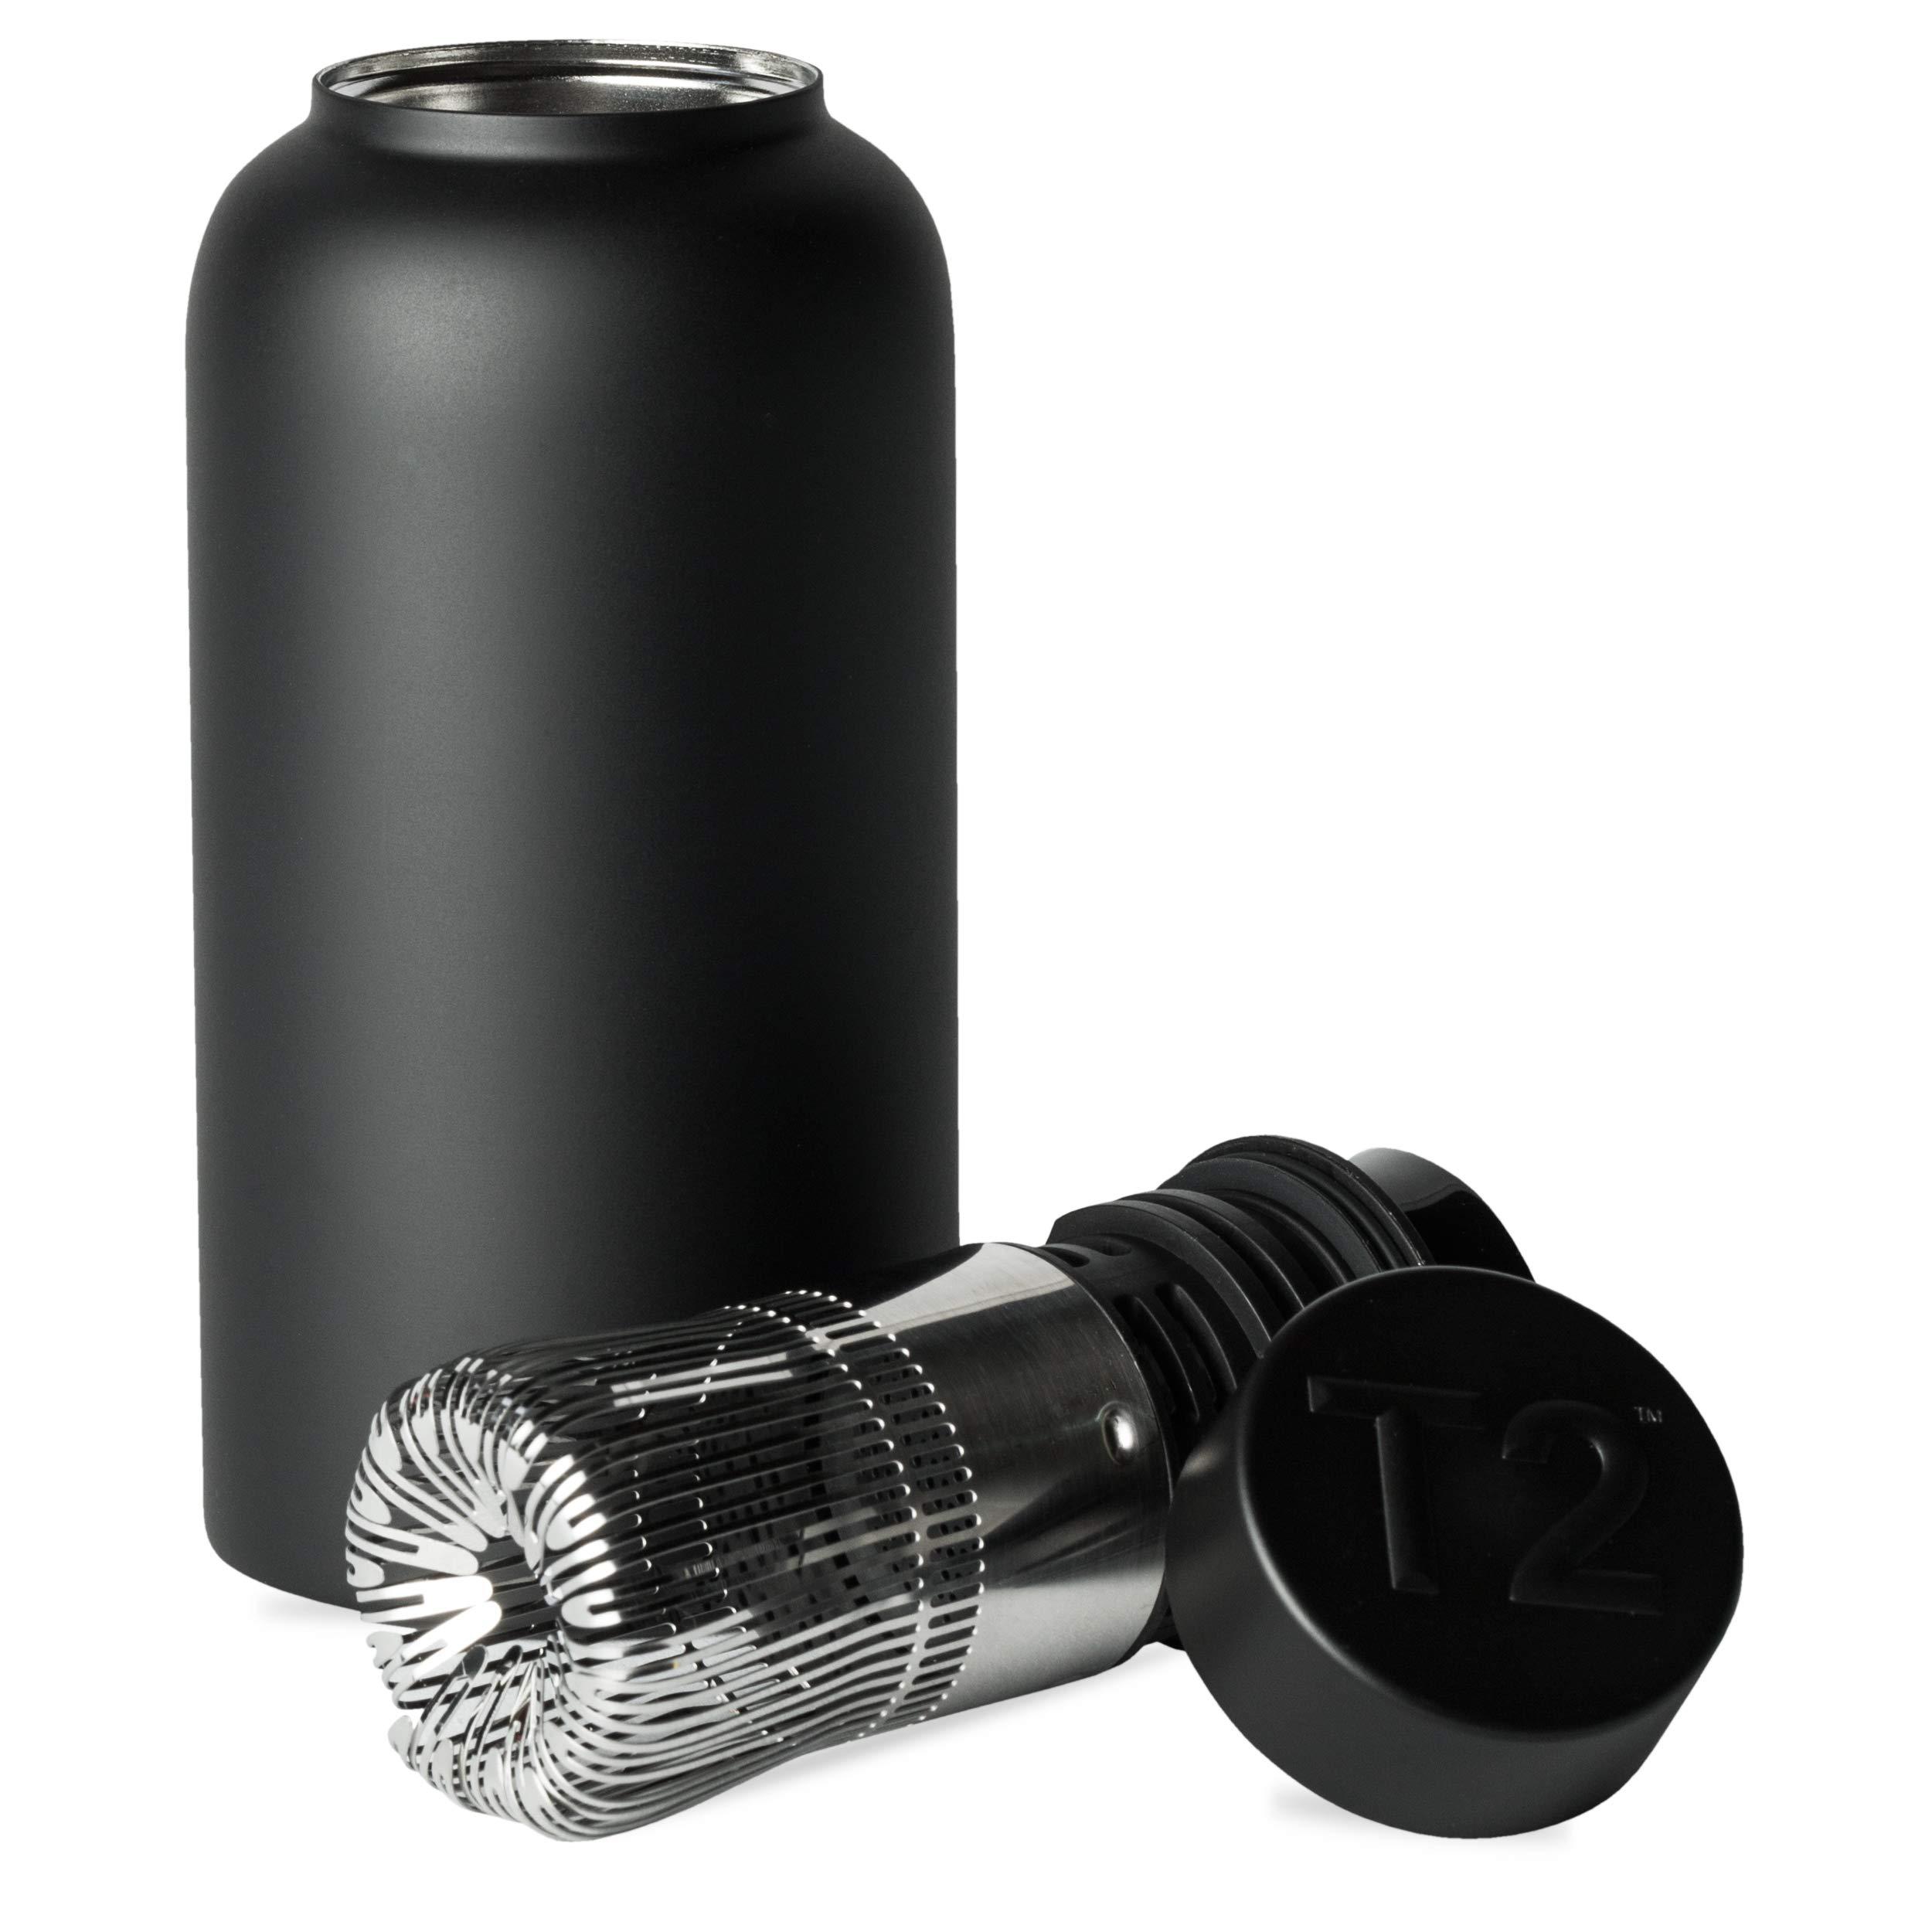 T2 Matcha Flask, 6.6 x 6.6 x 10.3 cm, Black, 35 Piece